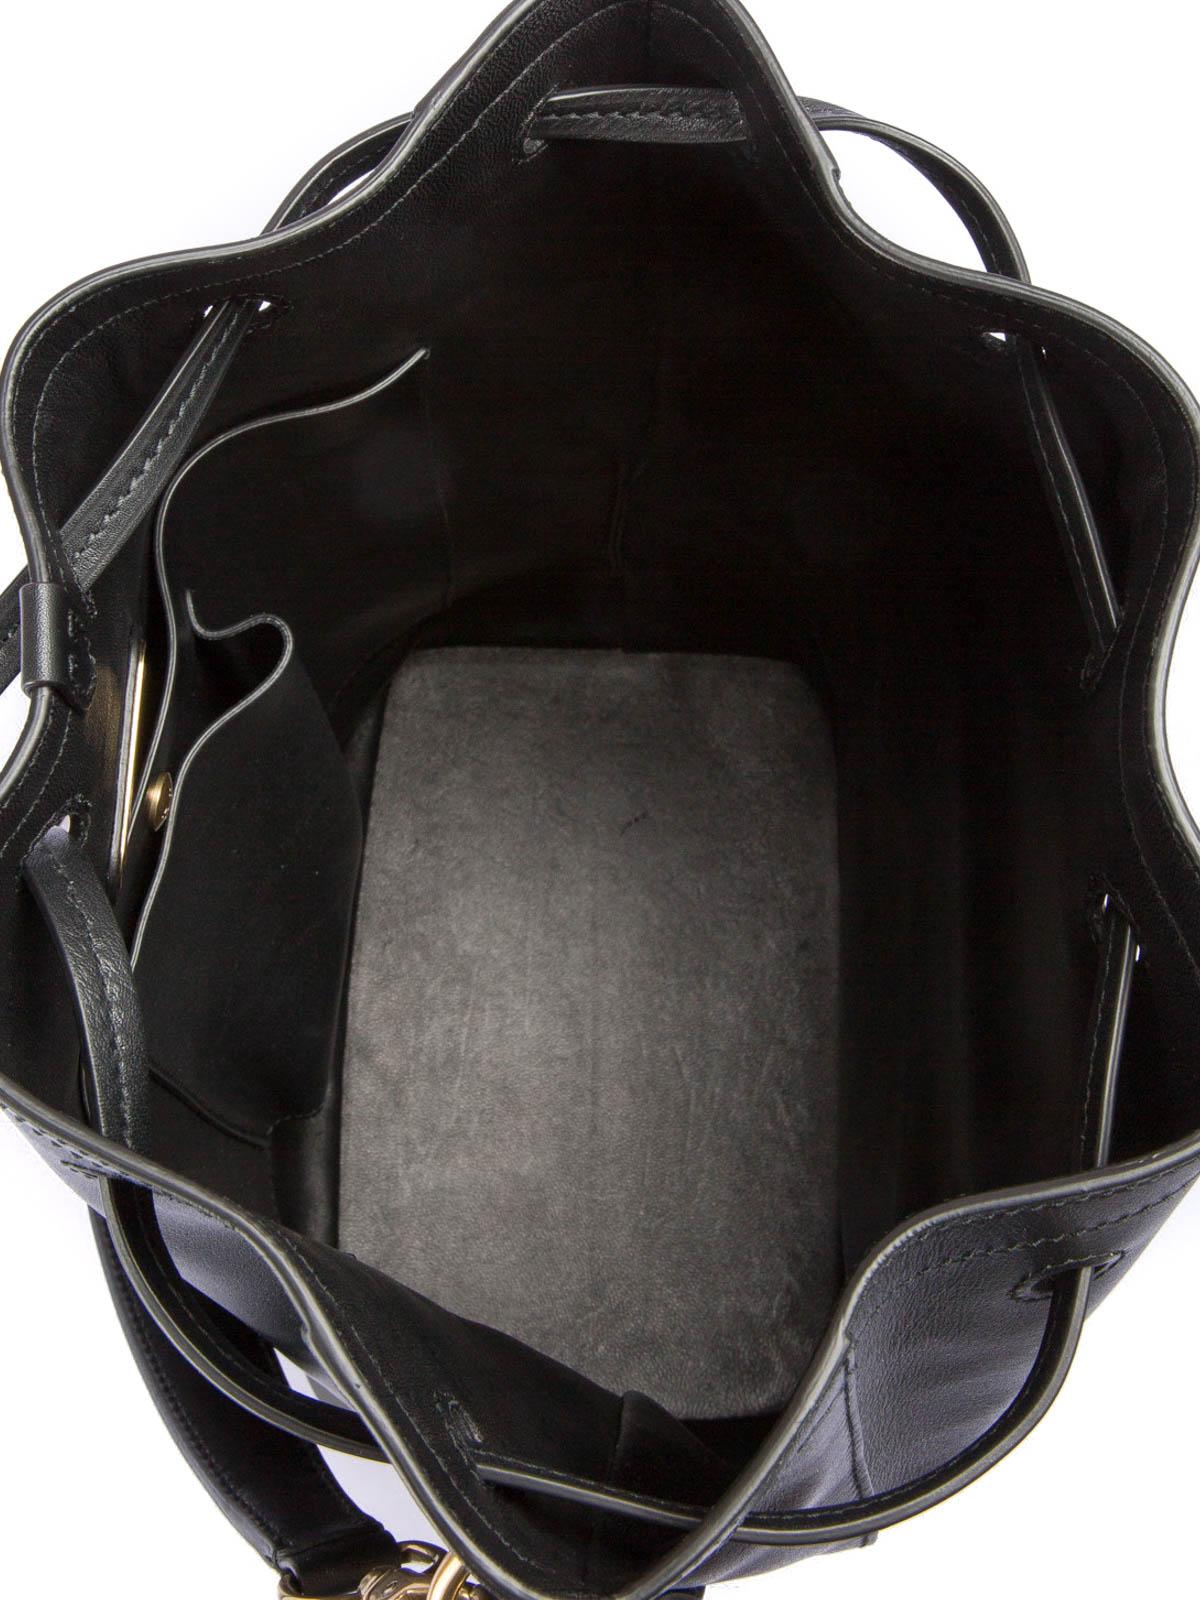 aeab8b3aab94 ... order ralph lauren buy online leather bucket bag 1735f 3ef5f